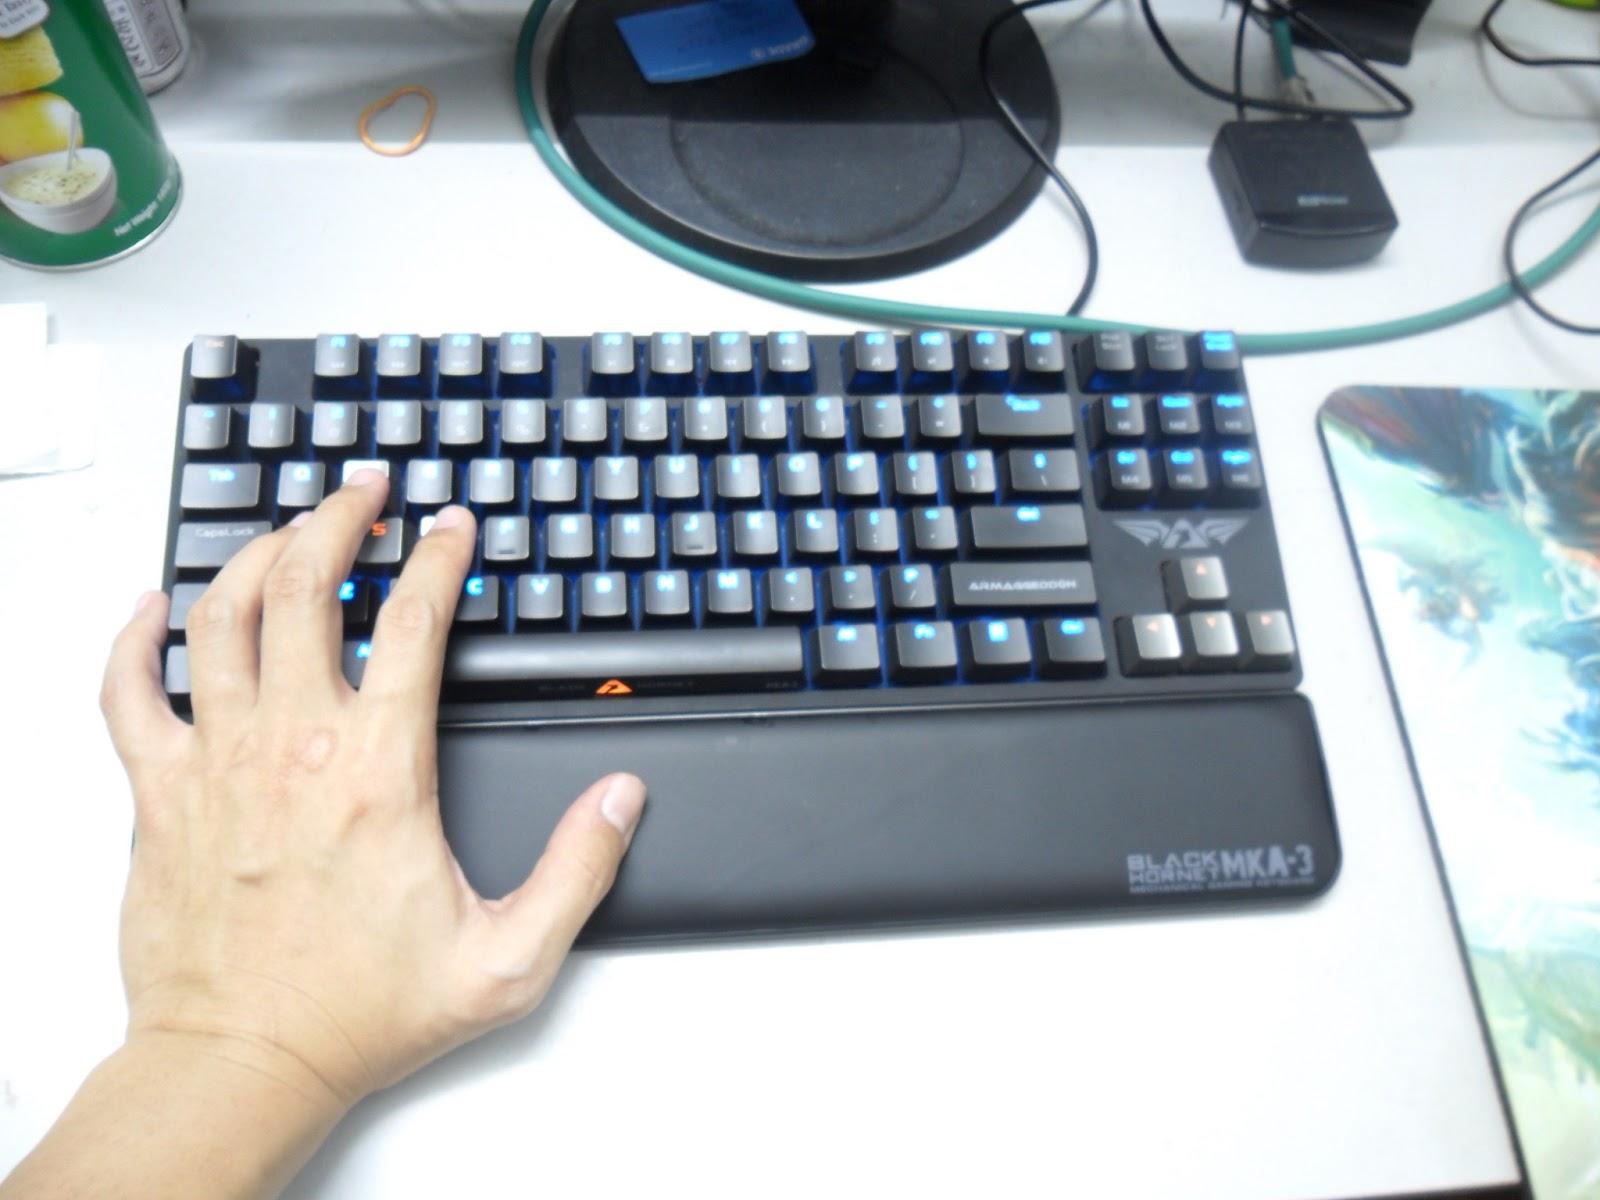 Unboxing & Review: Armaggeddon Black Hornet MKA-3 Mechanical Gaming Keyboard 23